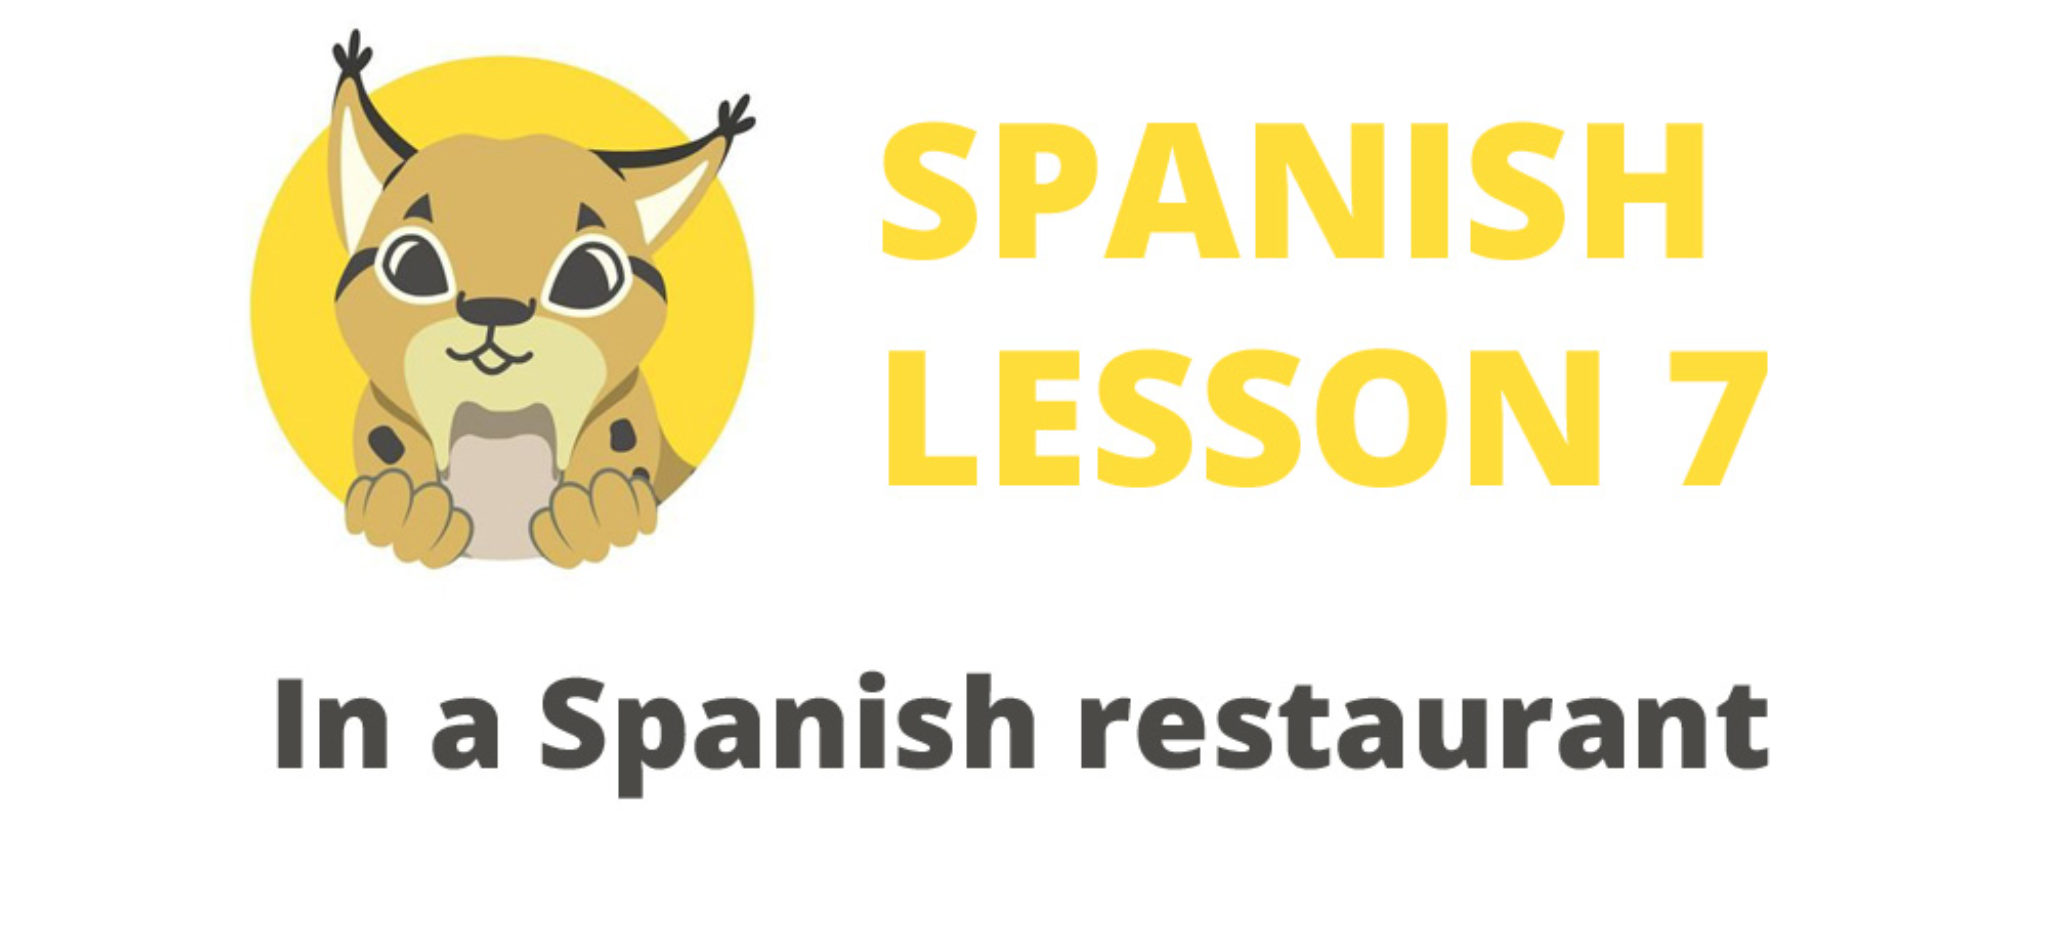 In a Spanish restaurant